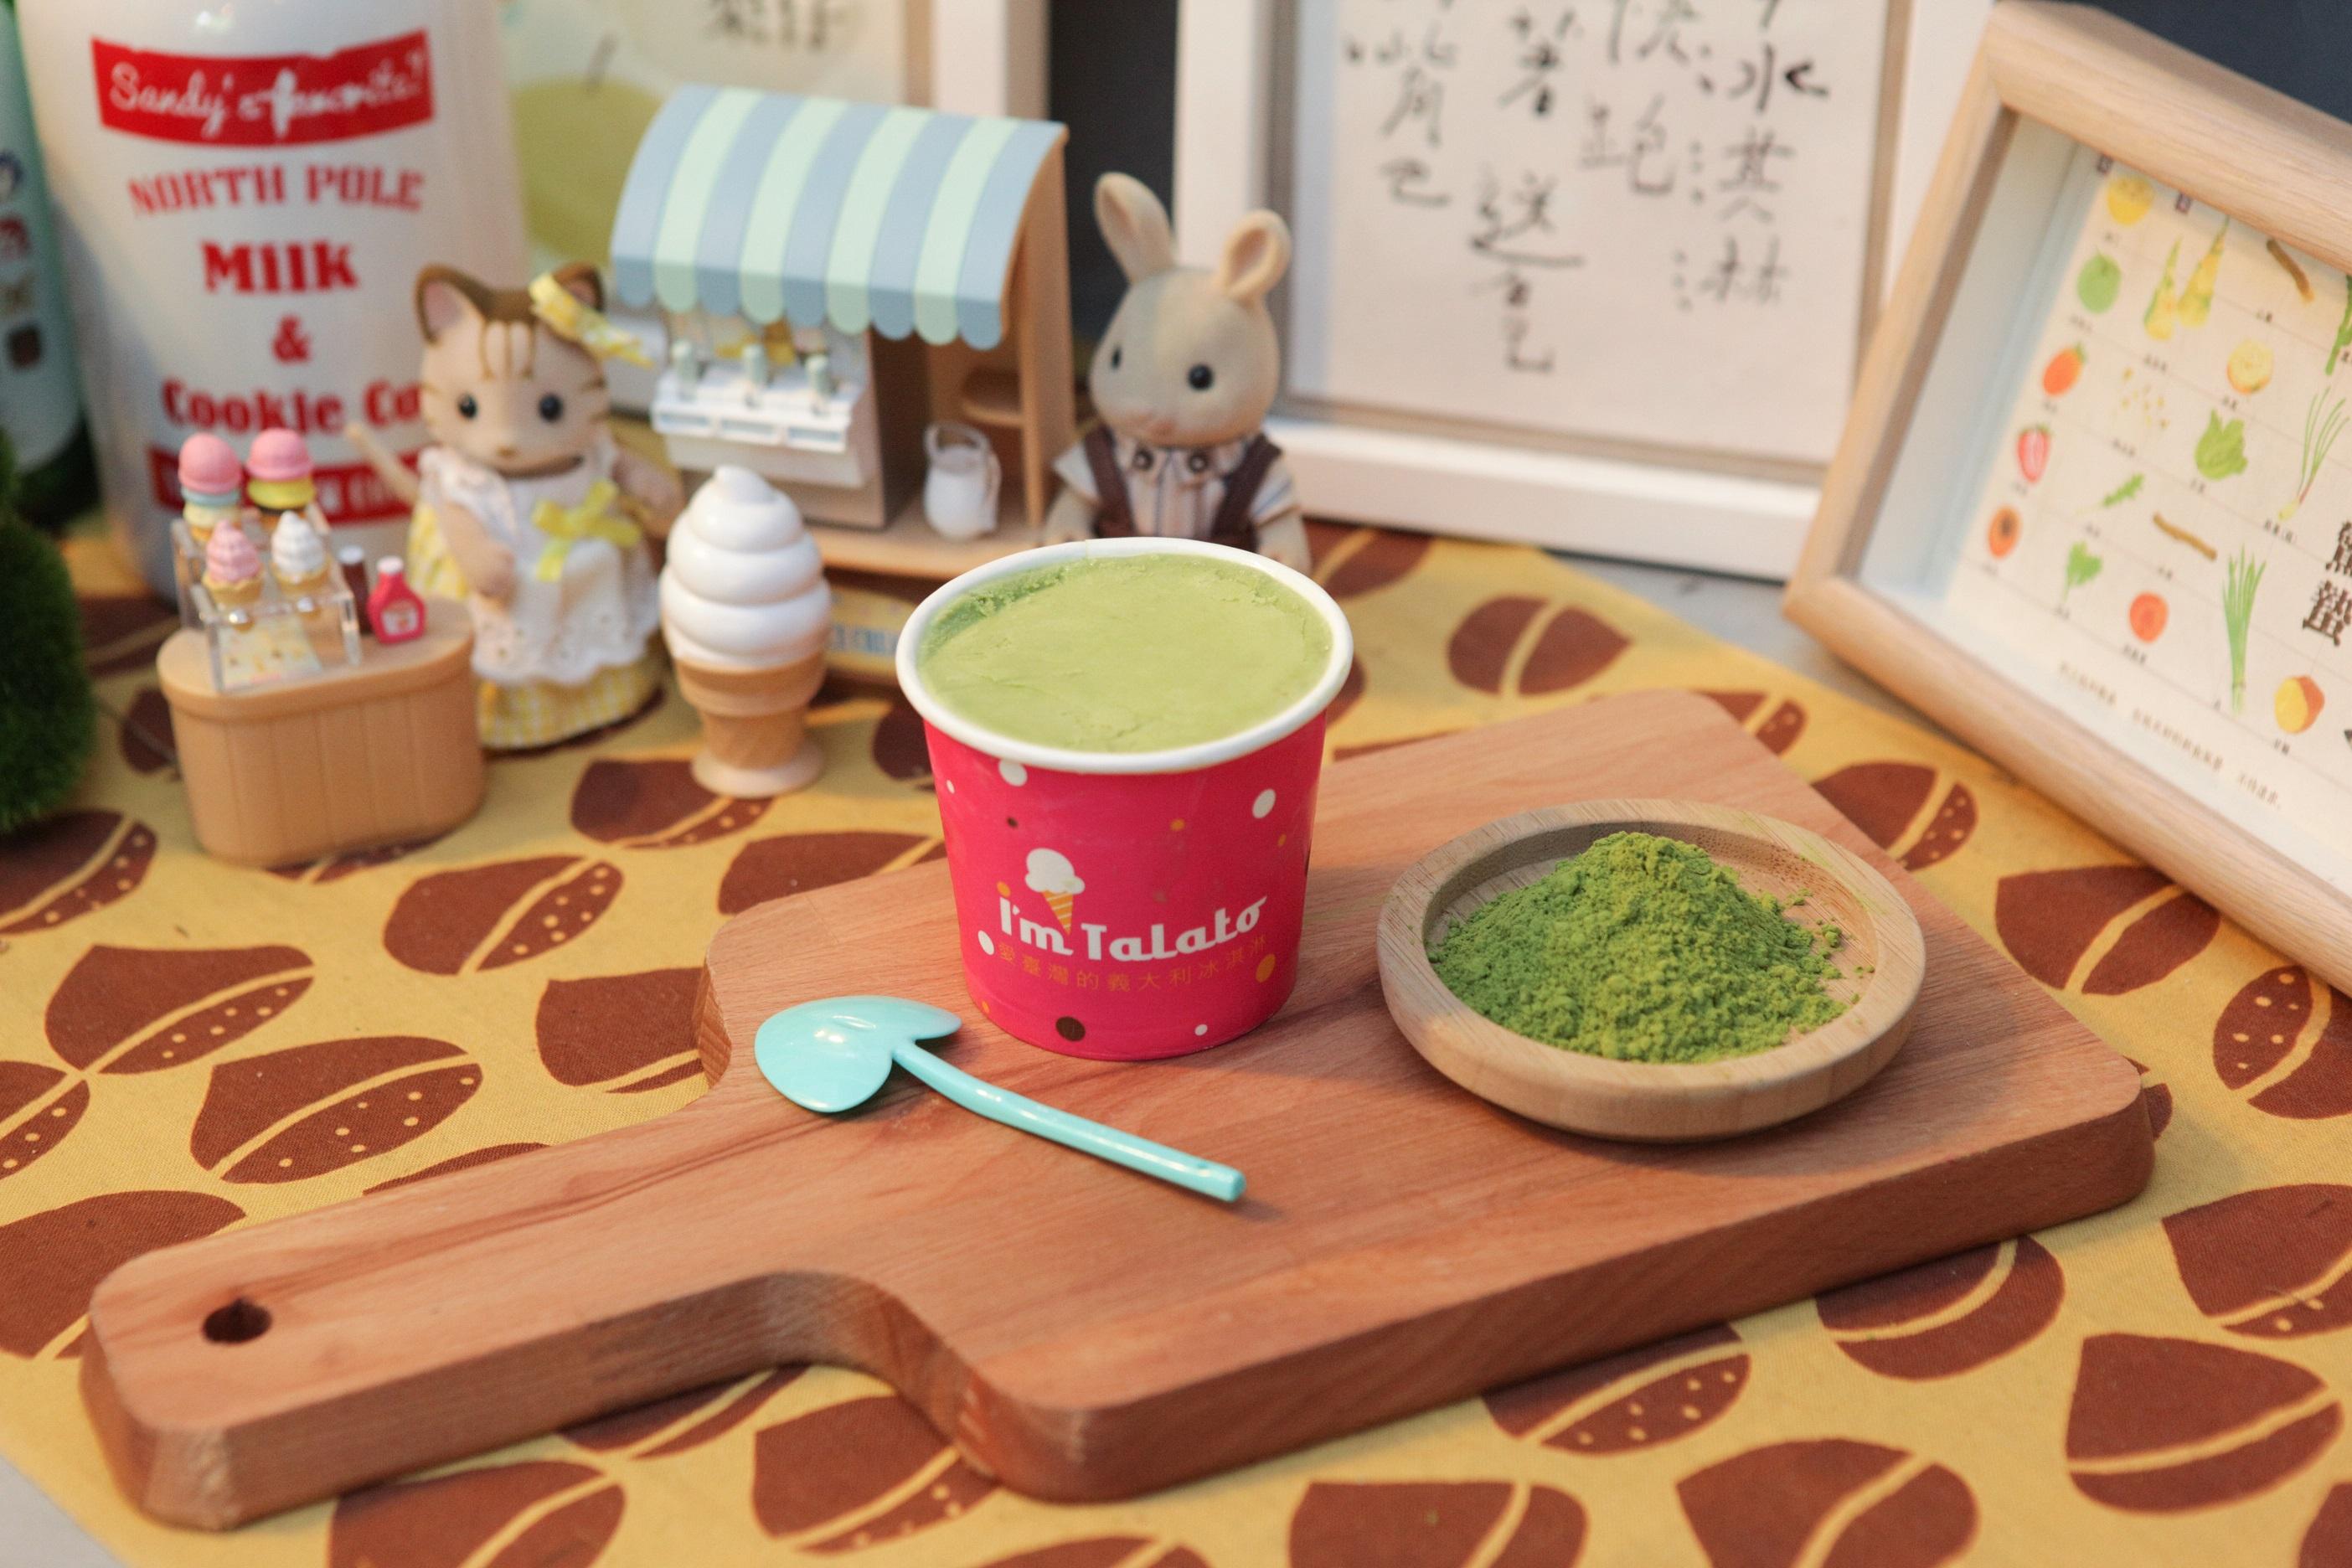 [i'm talato 義式冰淇淋] 峨嵋抹茶冰淇淋120ml/杯